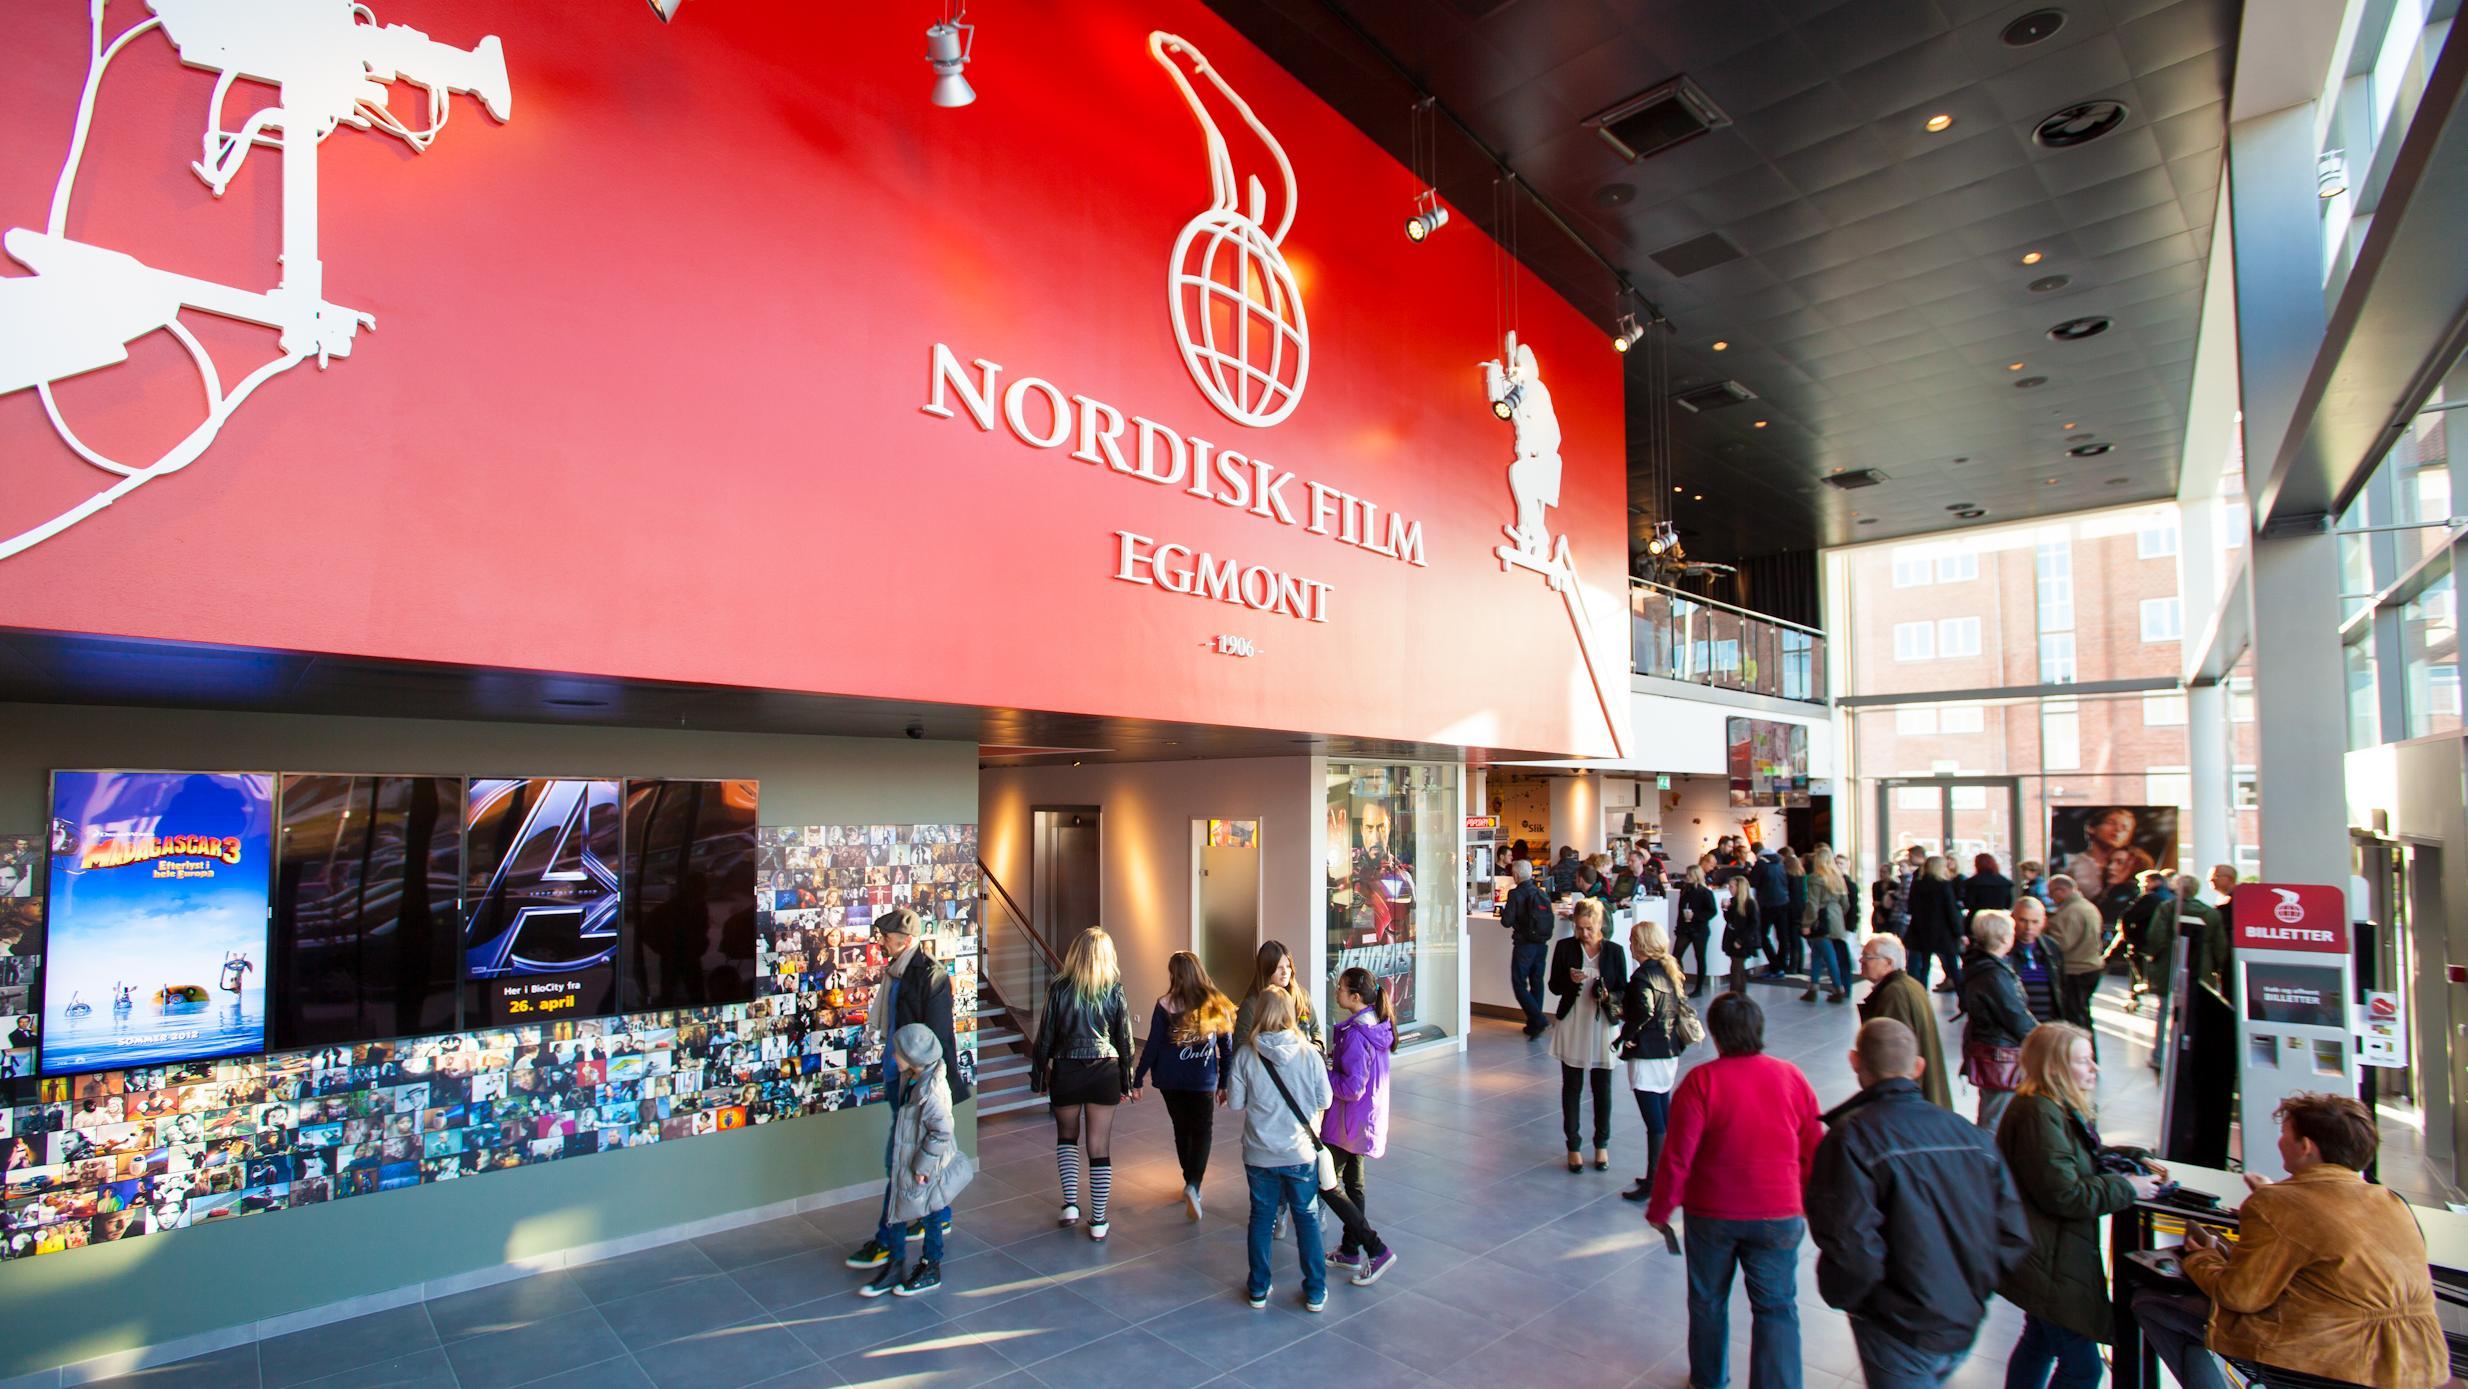 foyer_i_naestved_credit_nordiskfilmbiografer.jpg